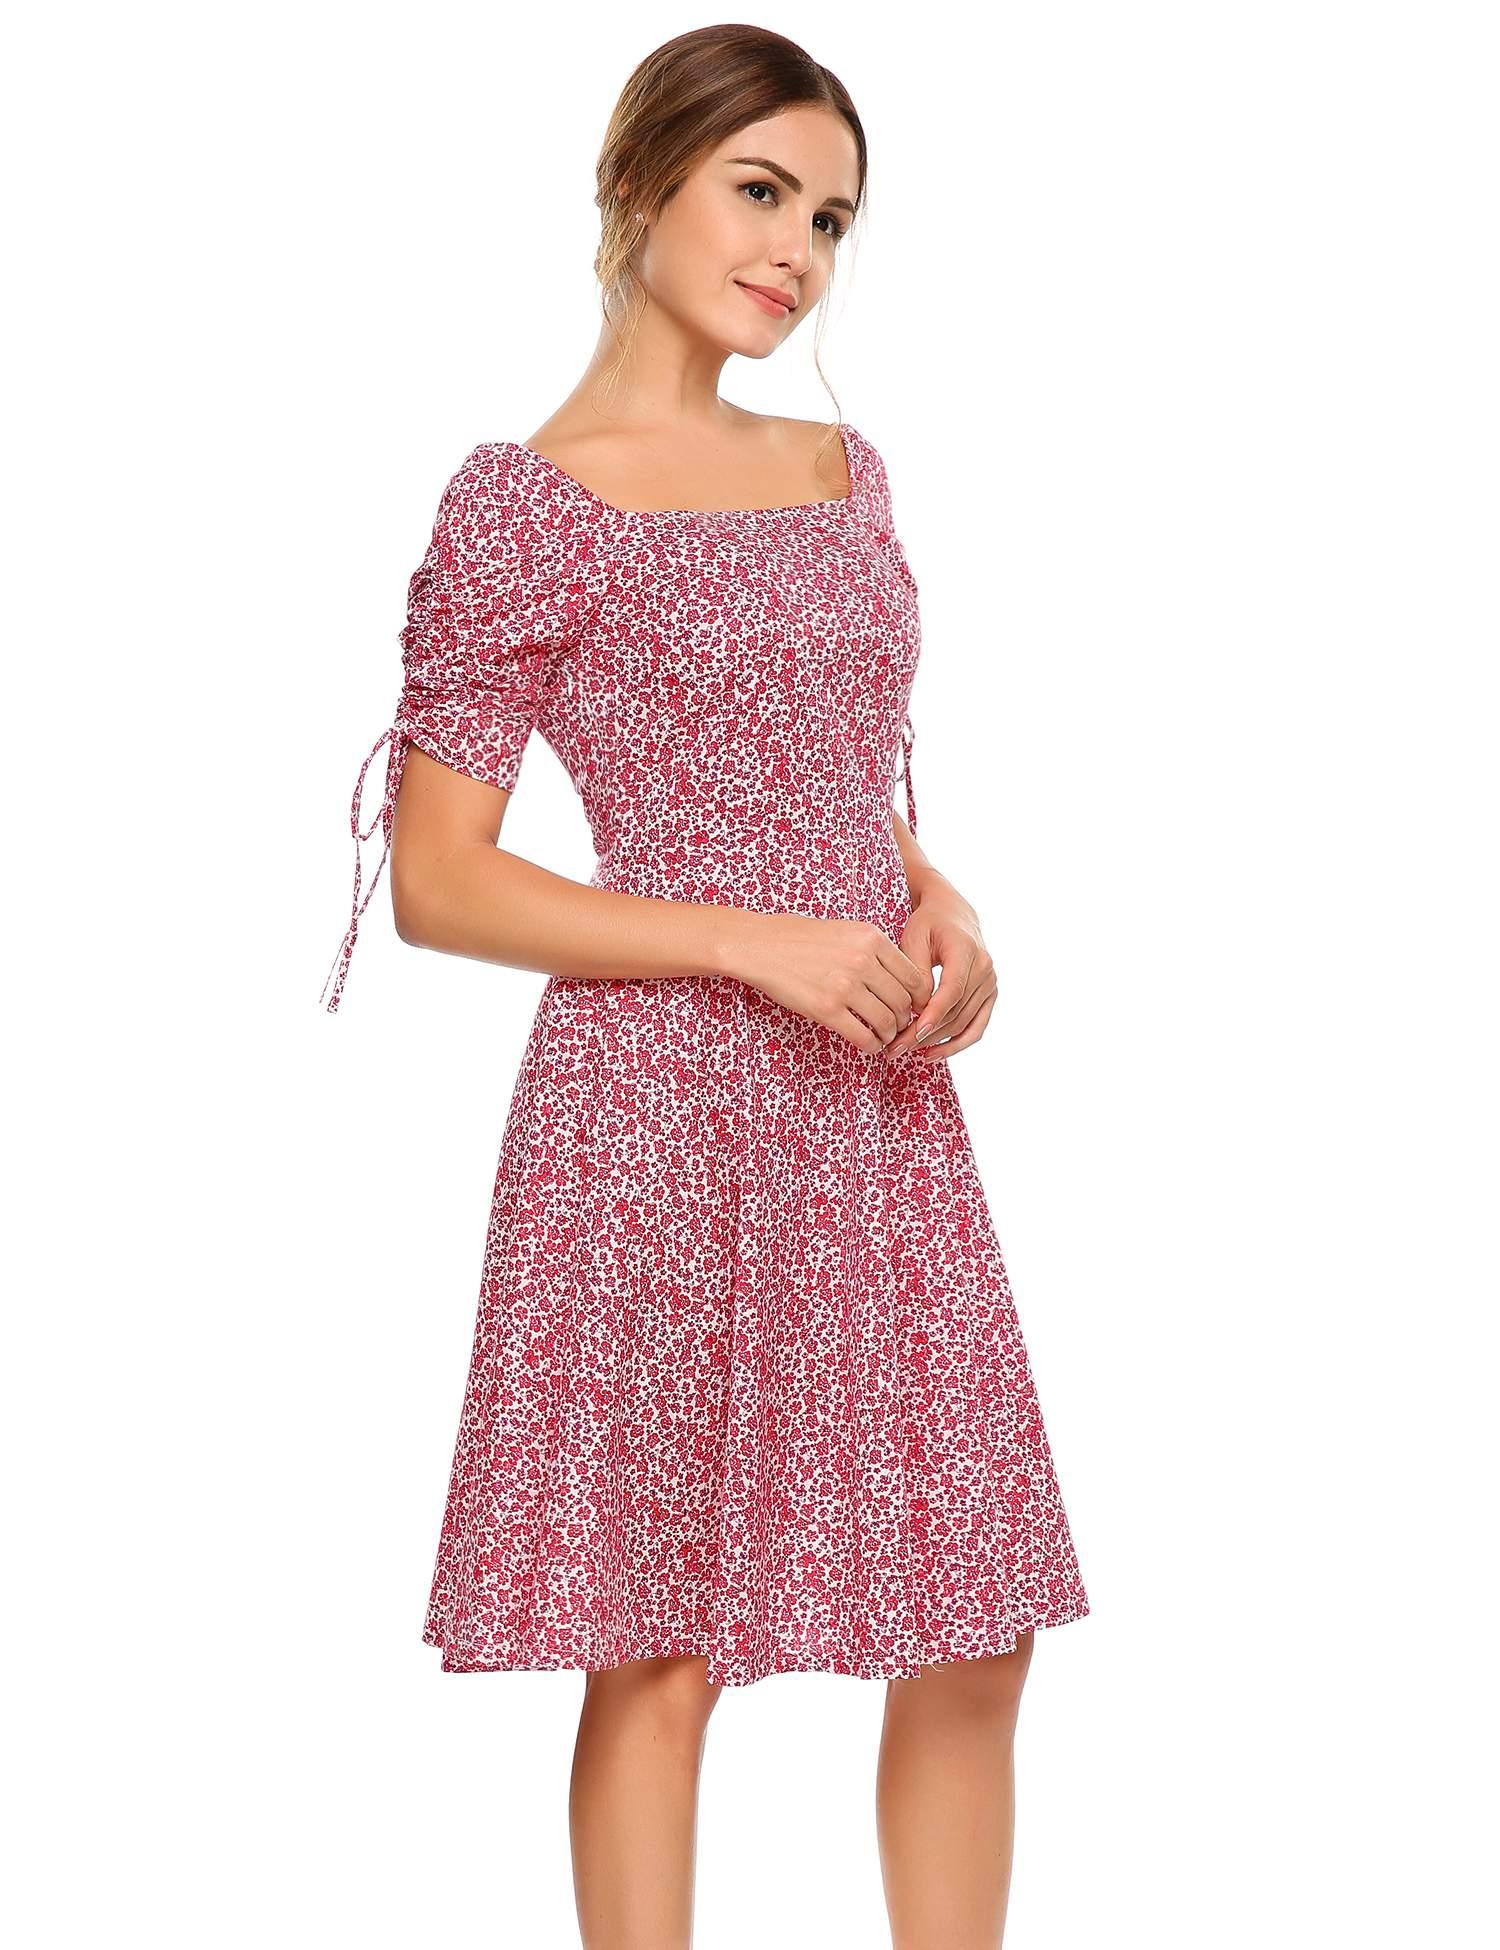 a0bb2fc289ee Women Vintage 3/4 Sleeve Floral Print Square Neck Party Swing Tunic Dress  HFON - Walmart.com